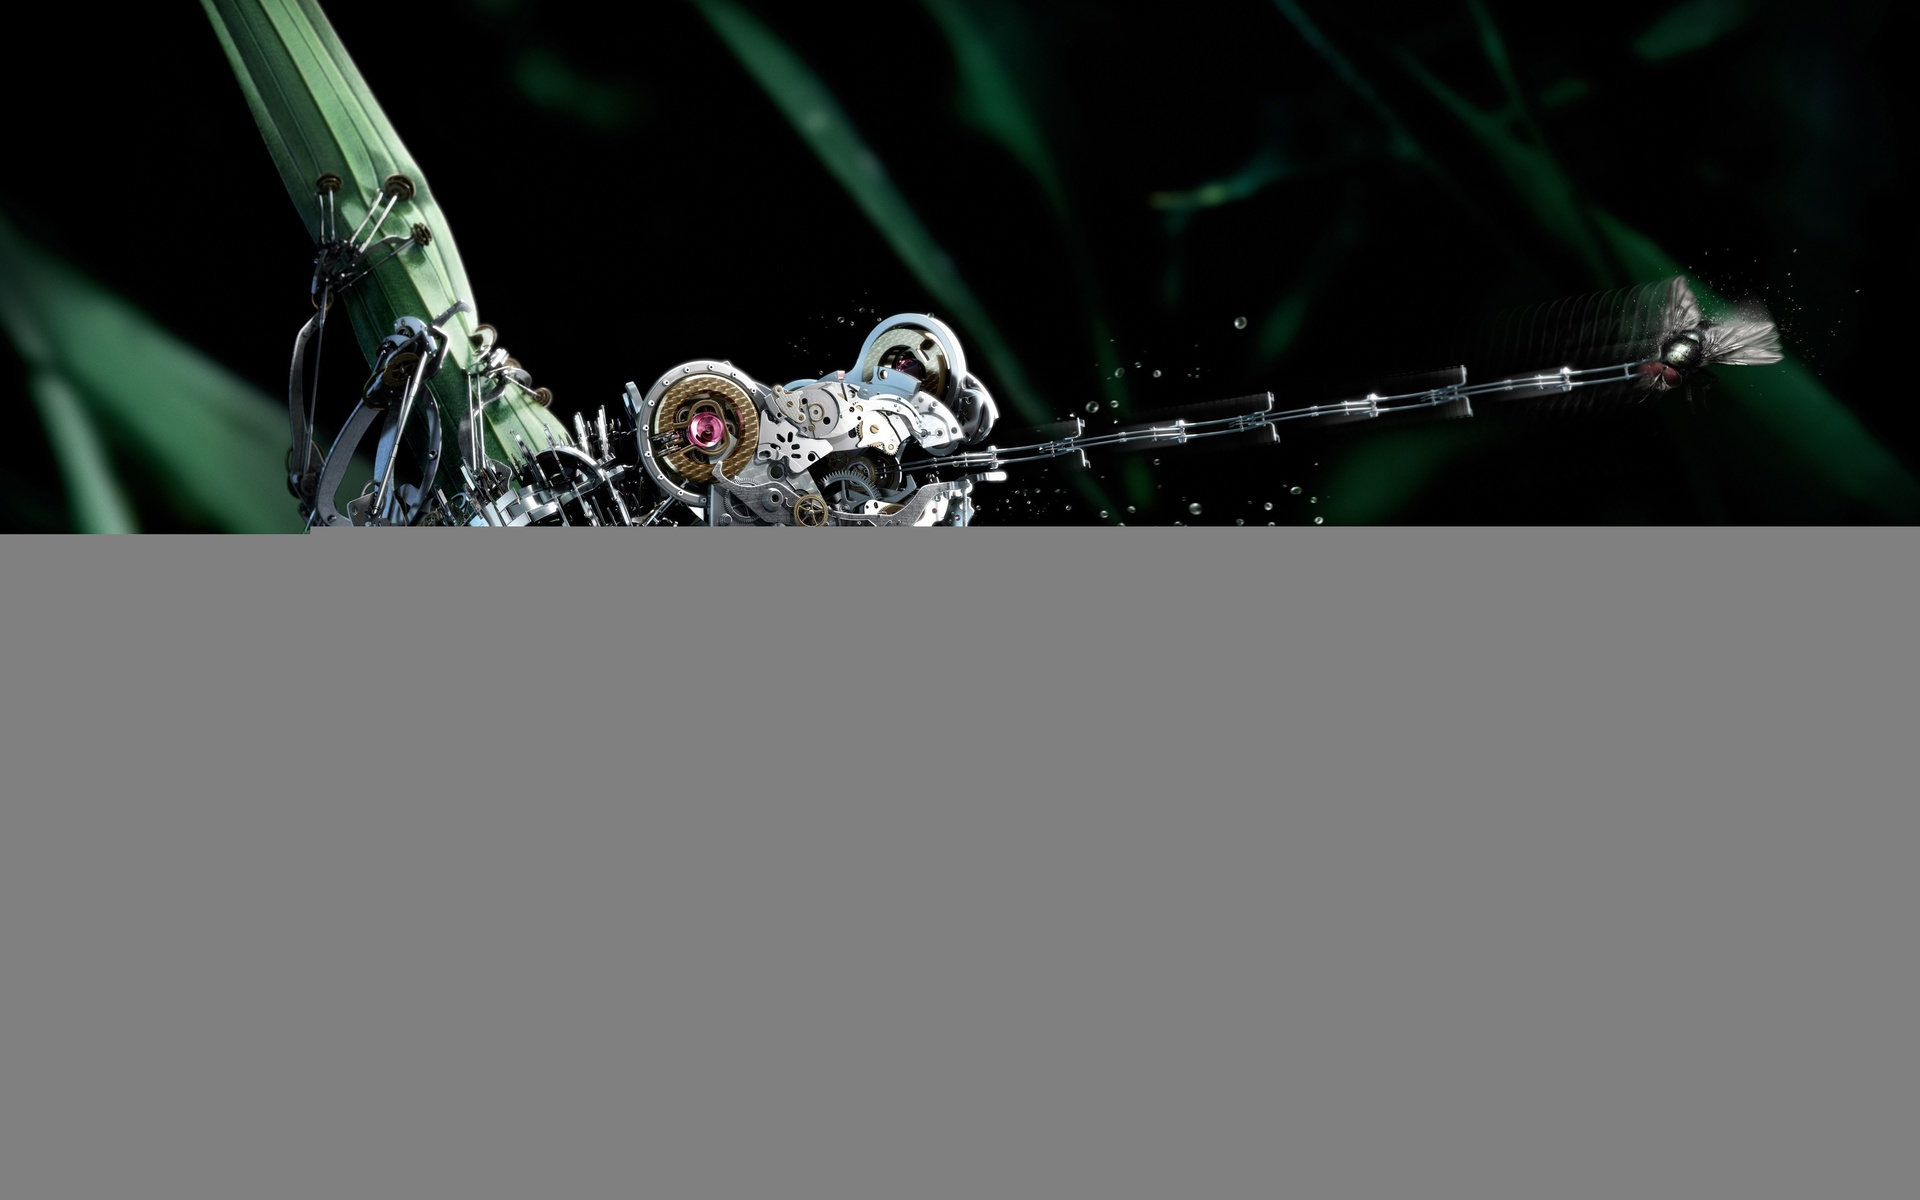 лягушка, муха, робот, макро